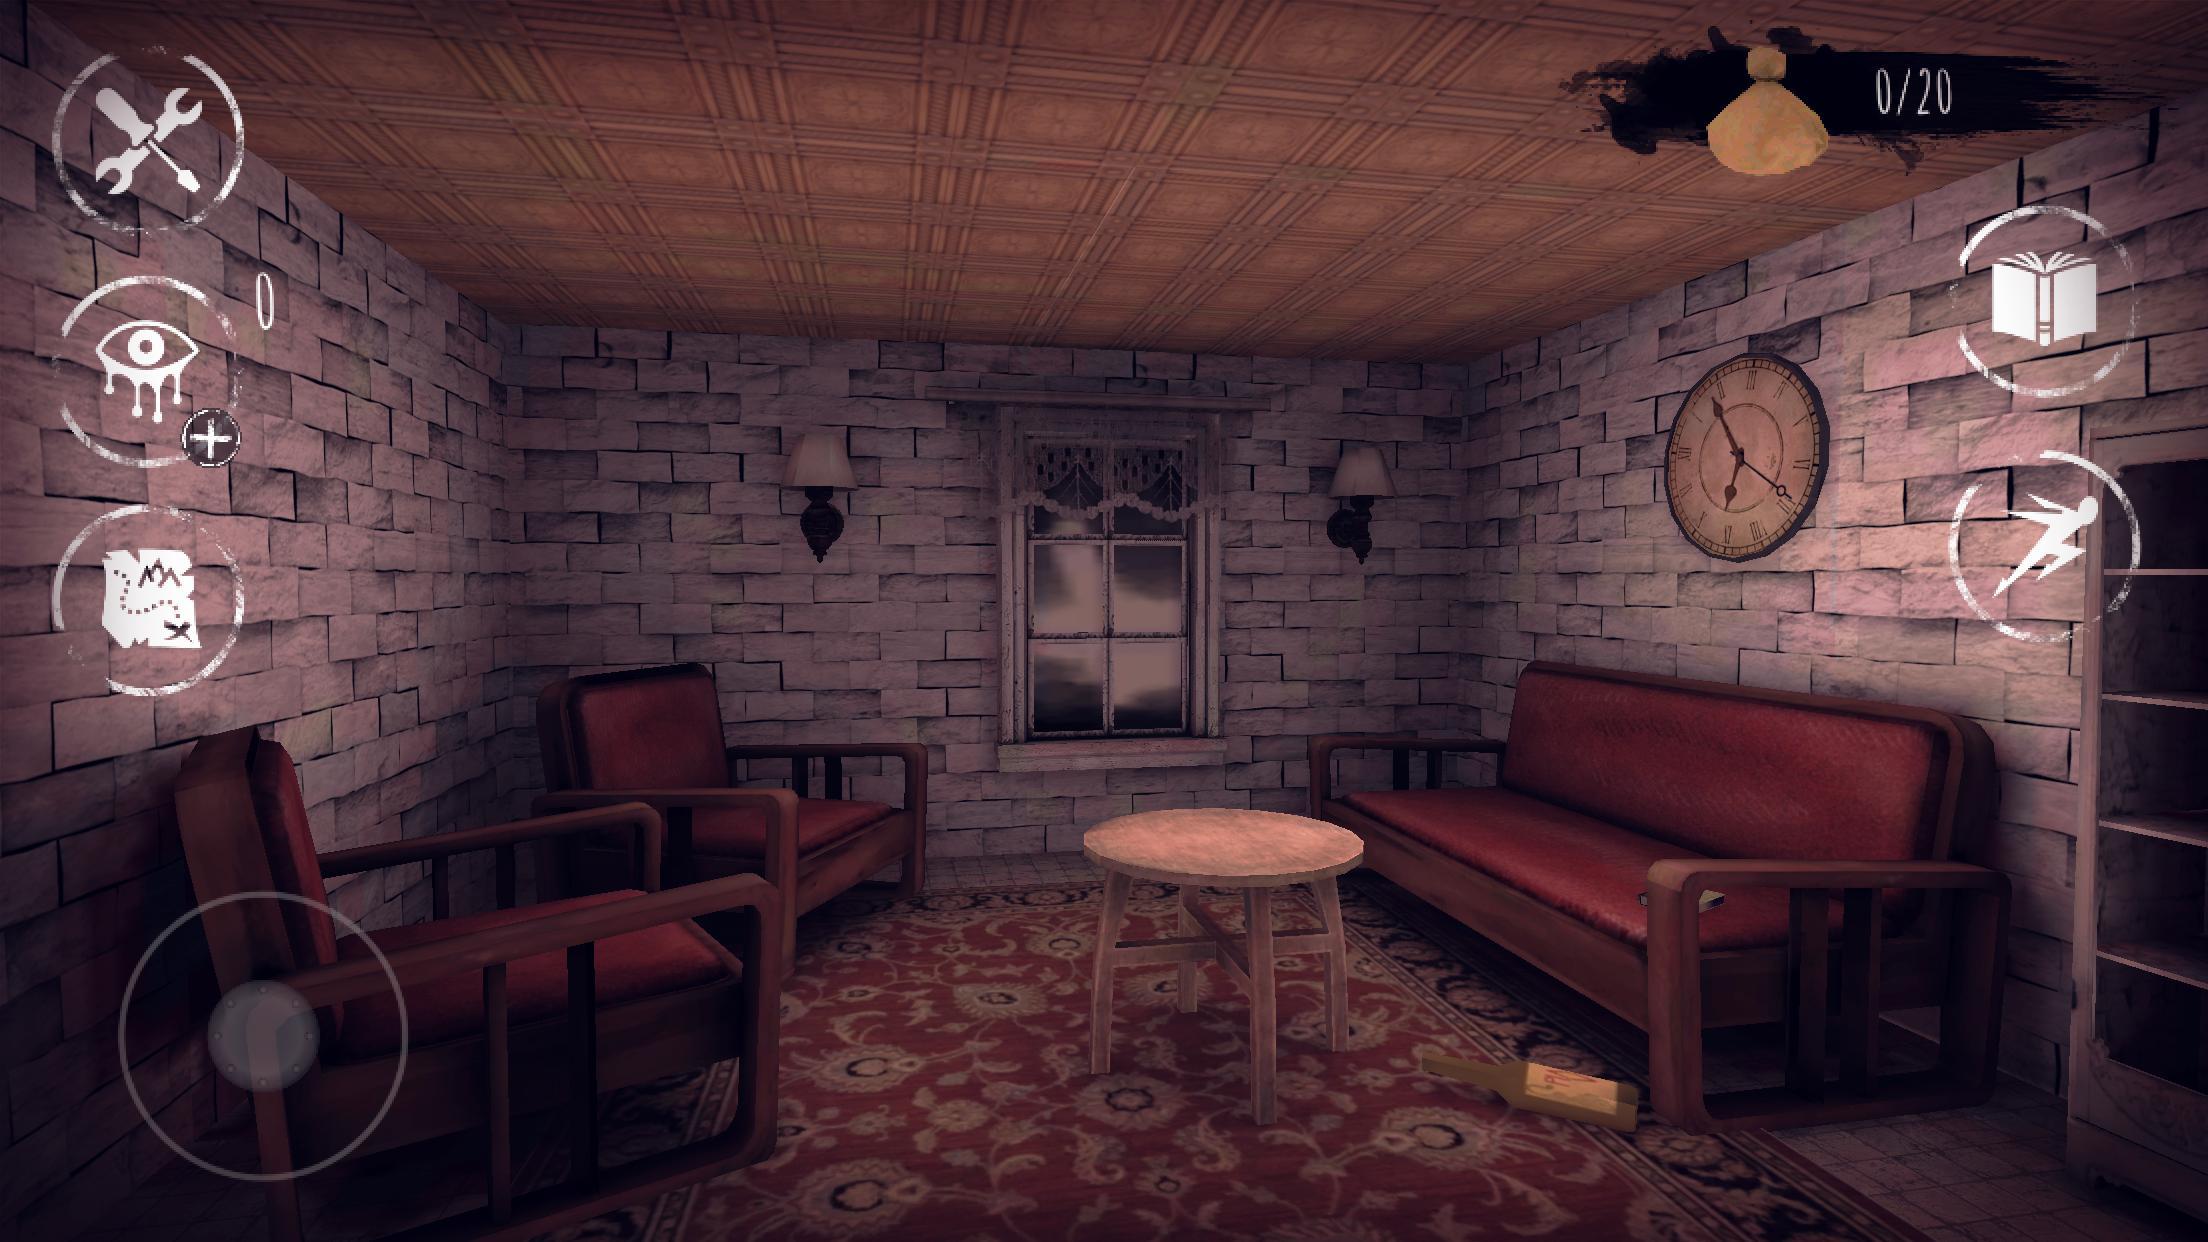 Eyes: Scary Thriller - Creepy Horror Game 6.1.1 Screenshot 18